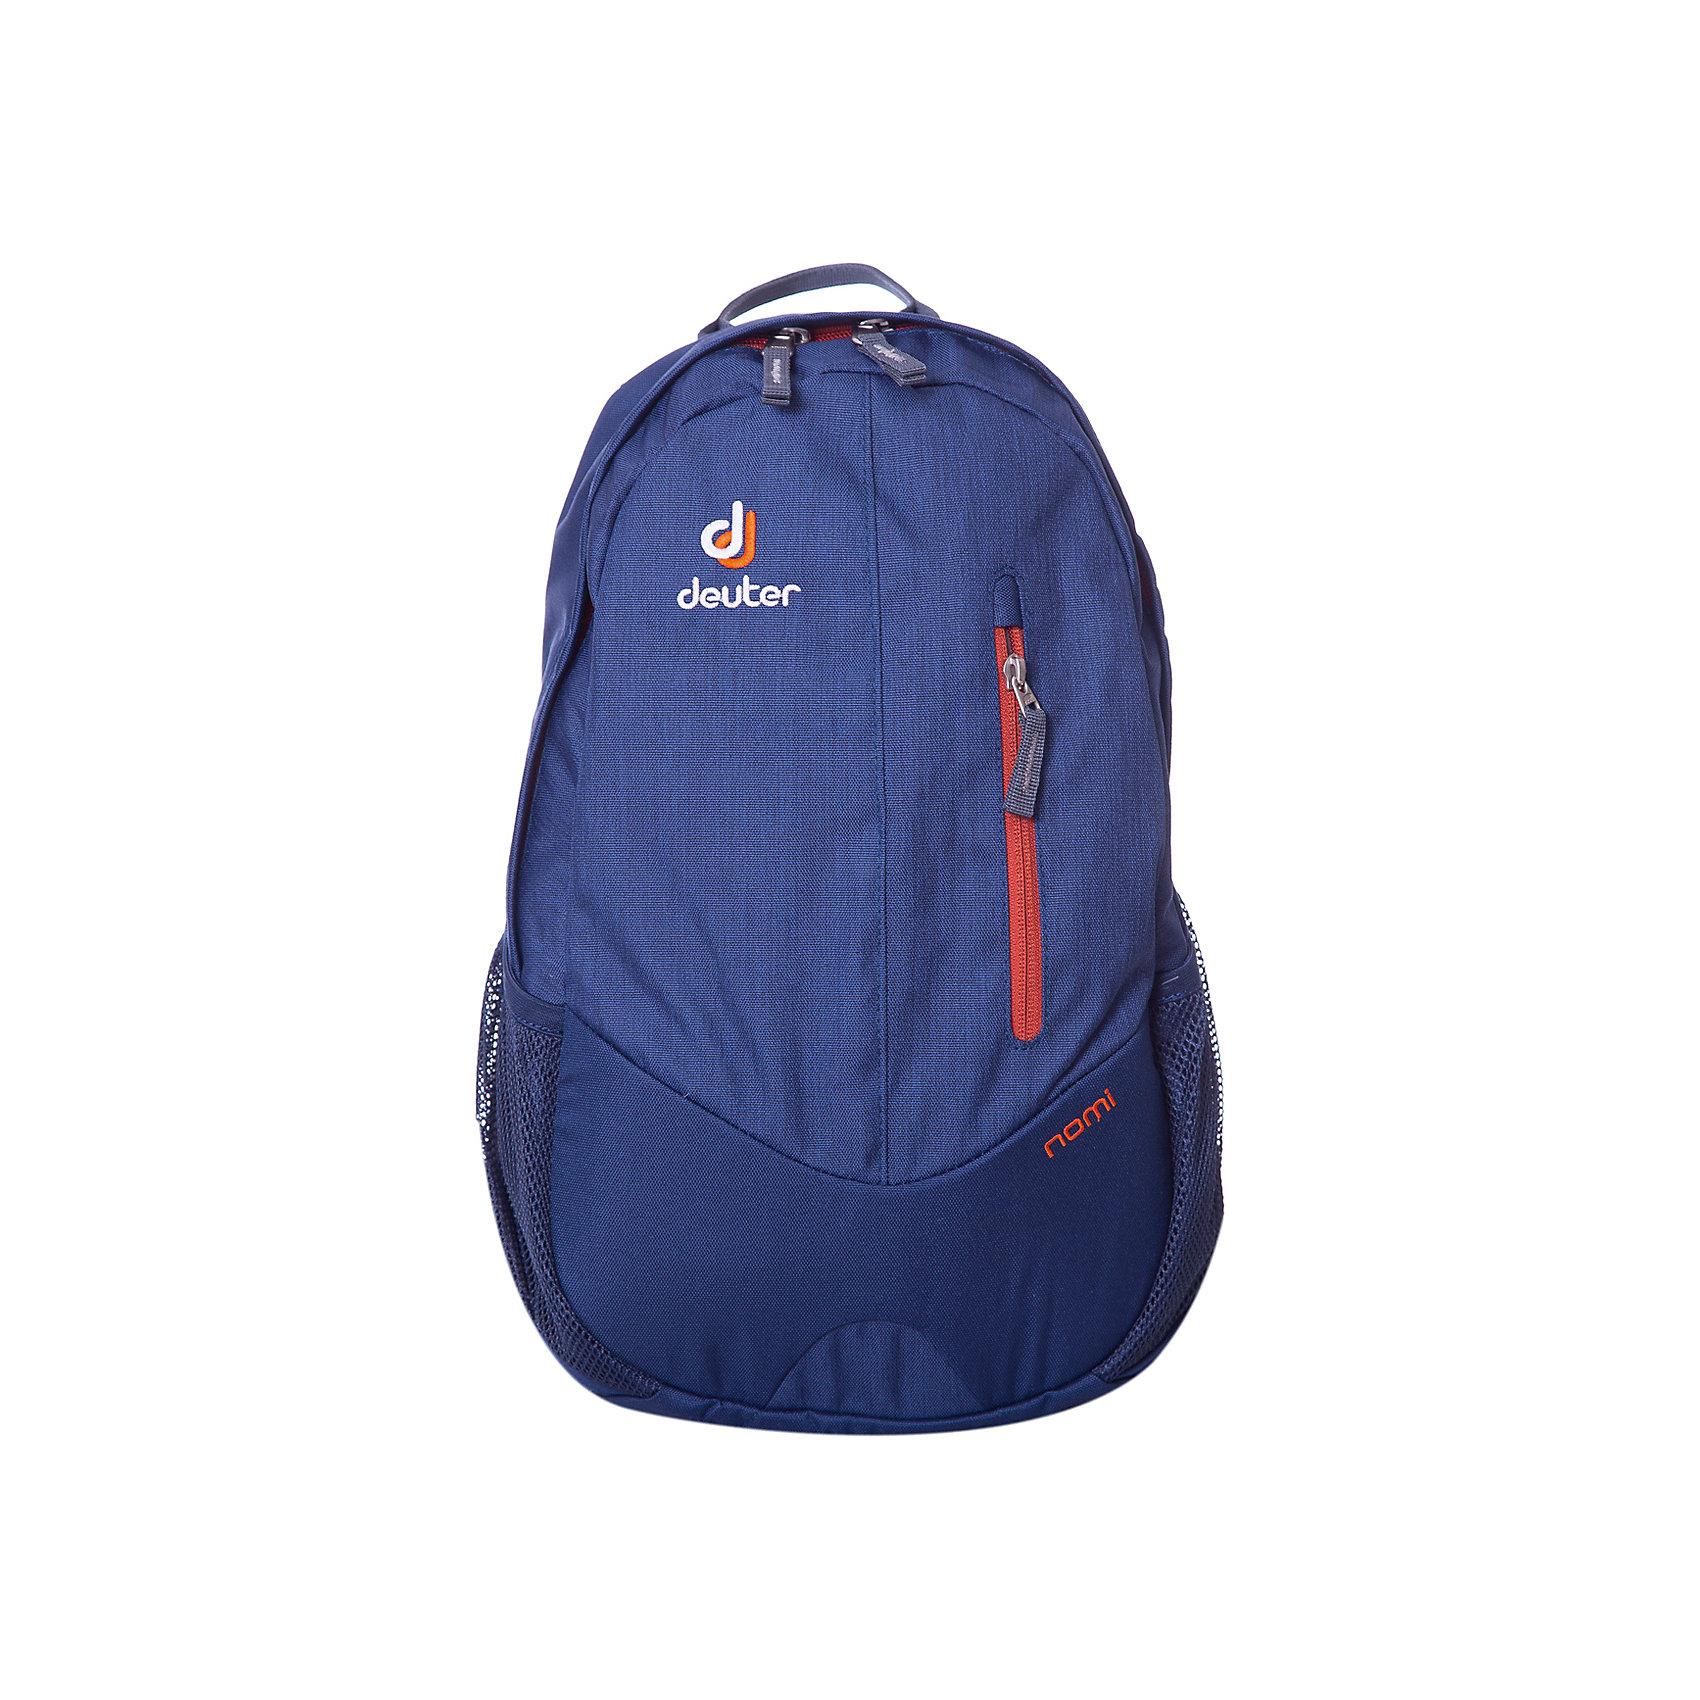 Deuter Школьный рюкзак Nomi, Deuter рюкзак deuter gigant 32l 2017 bay dresscode